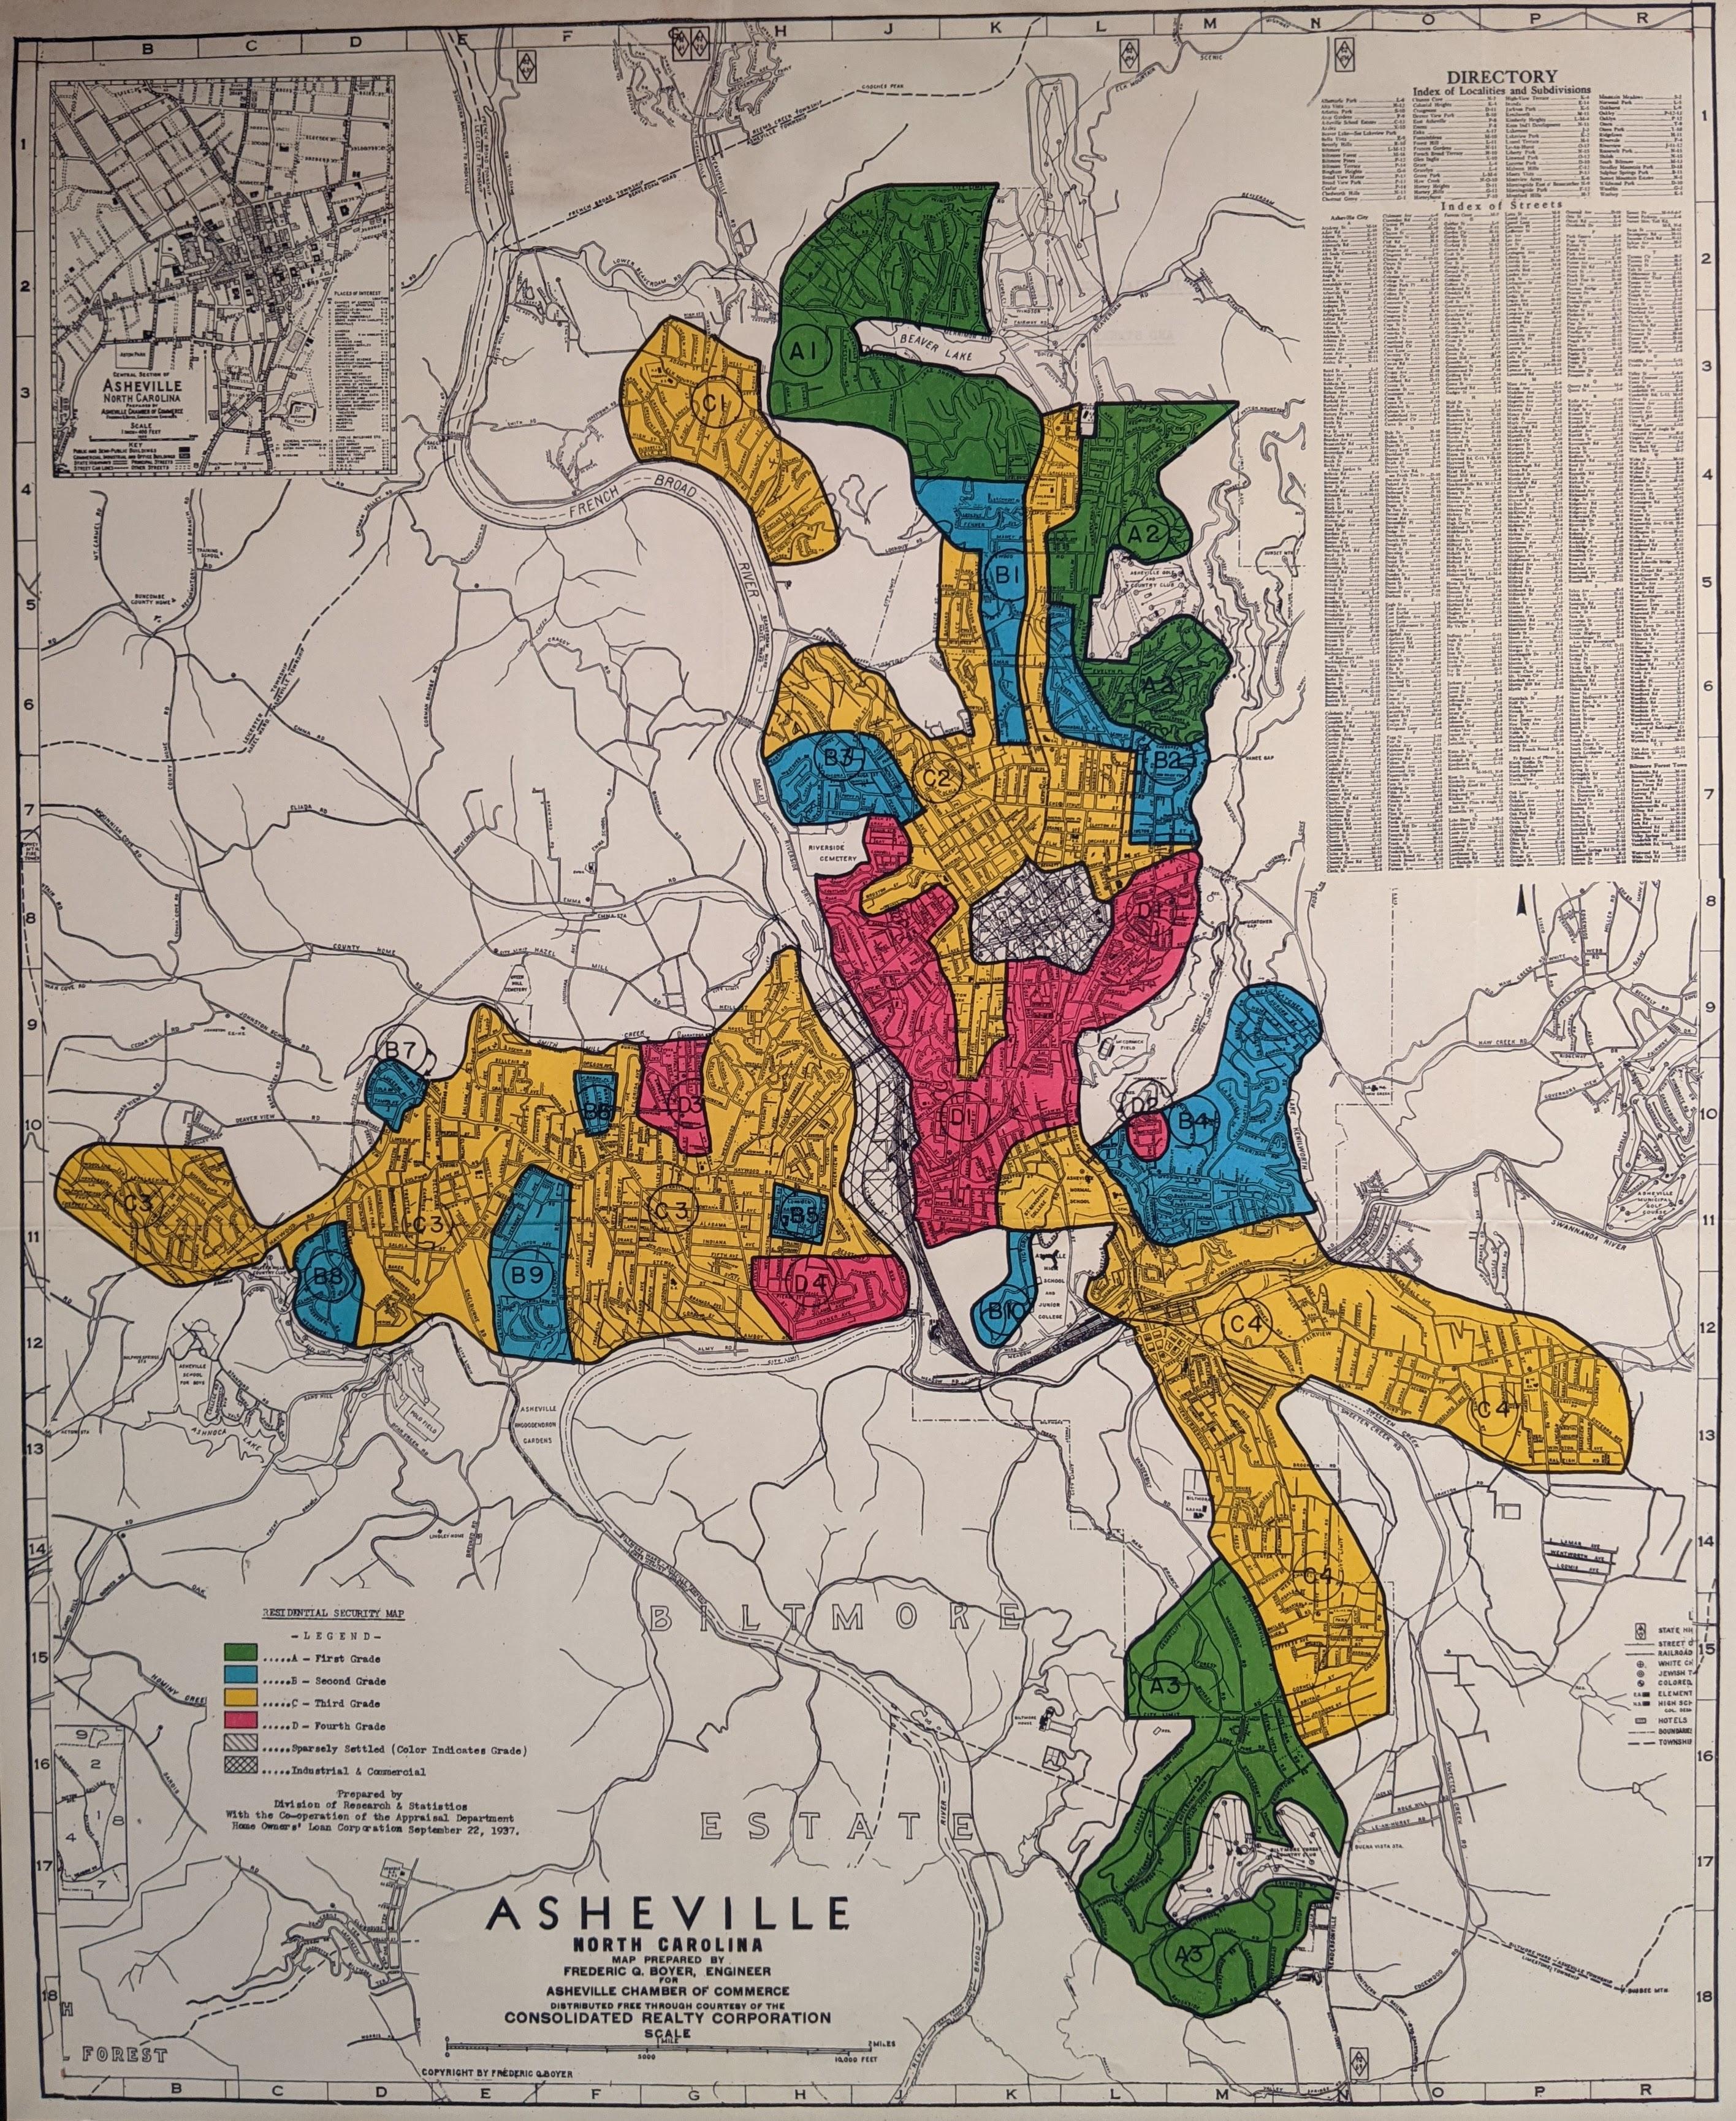 Urban Renewal in Asheville Map